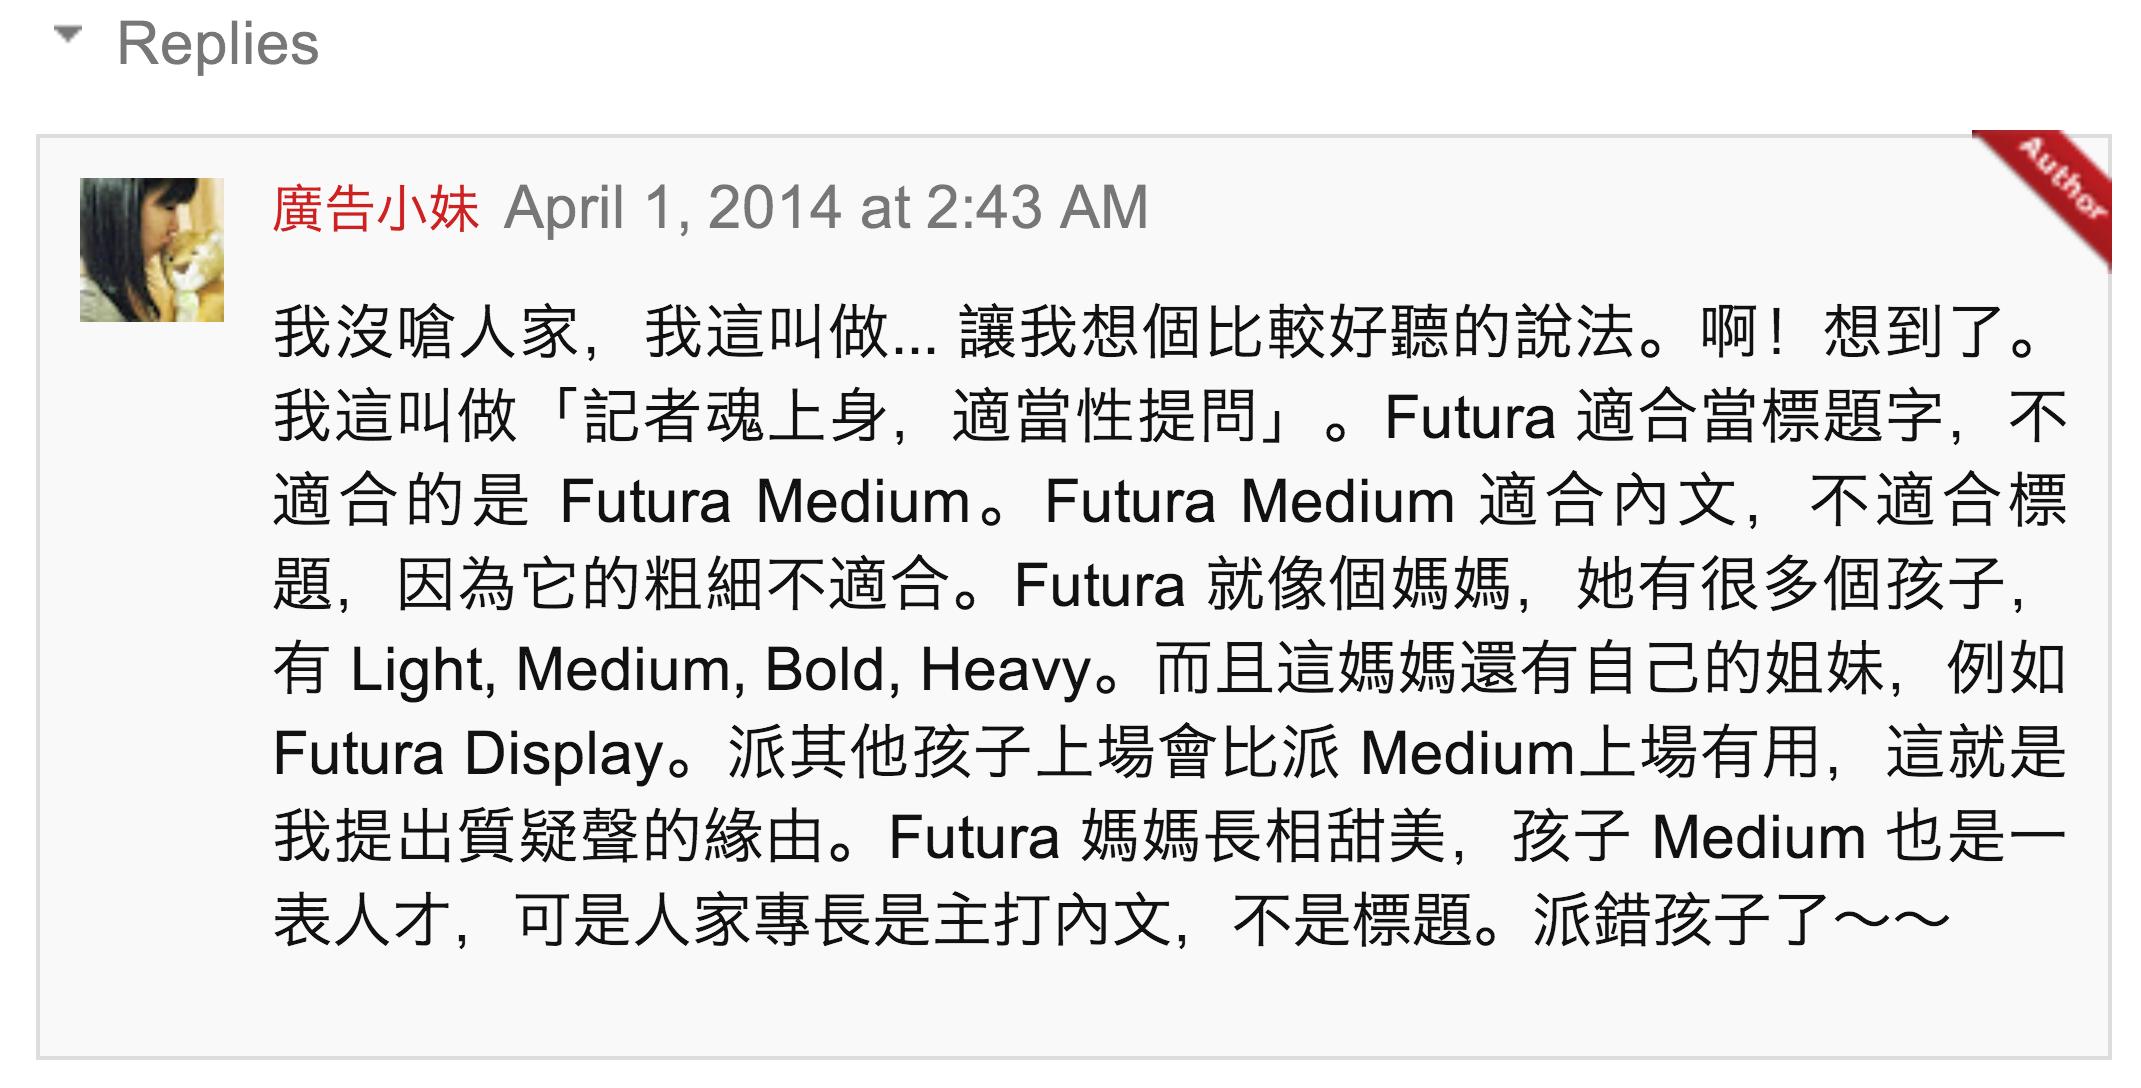 Futura 內文